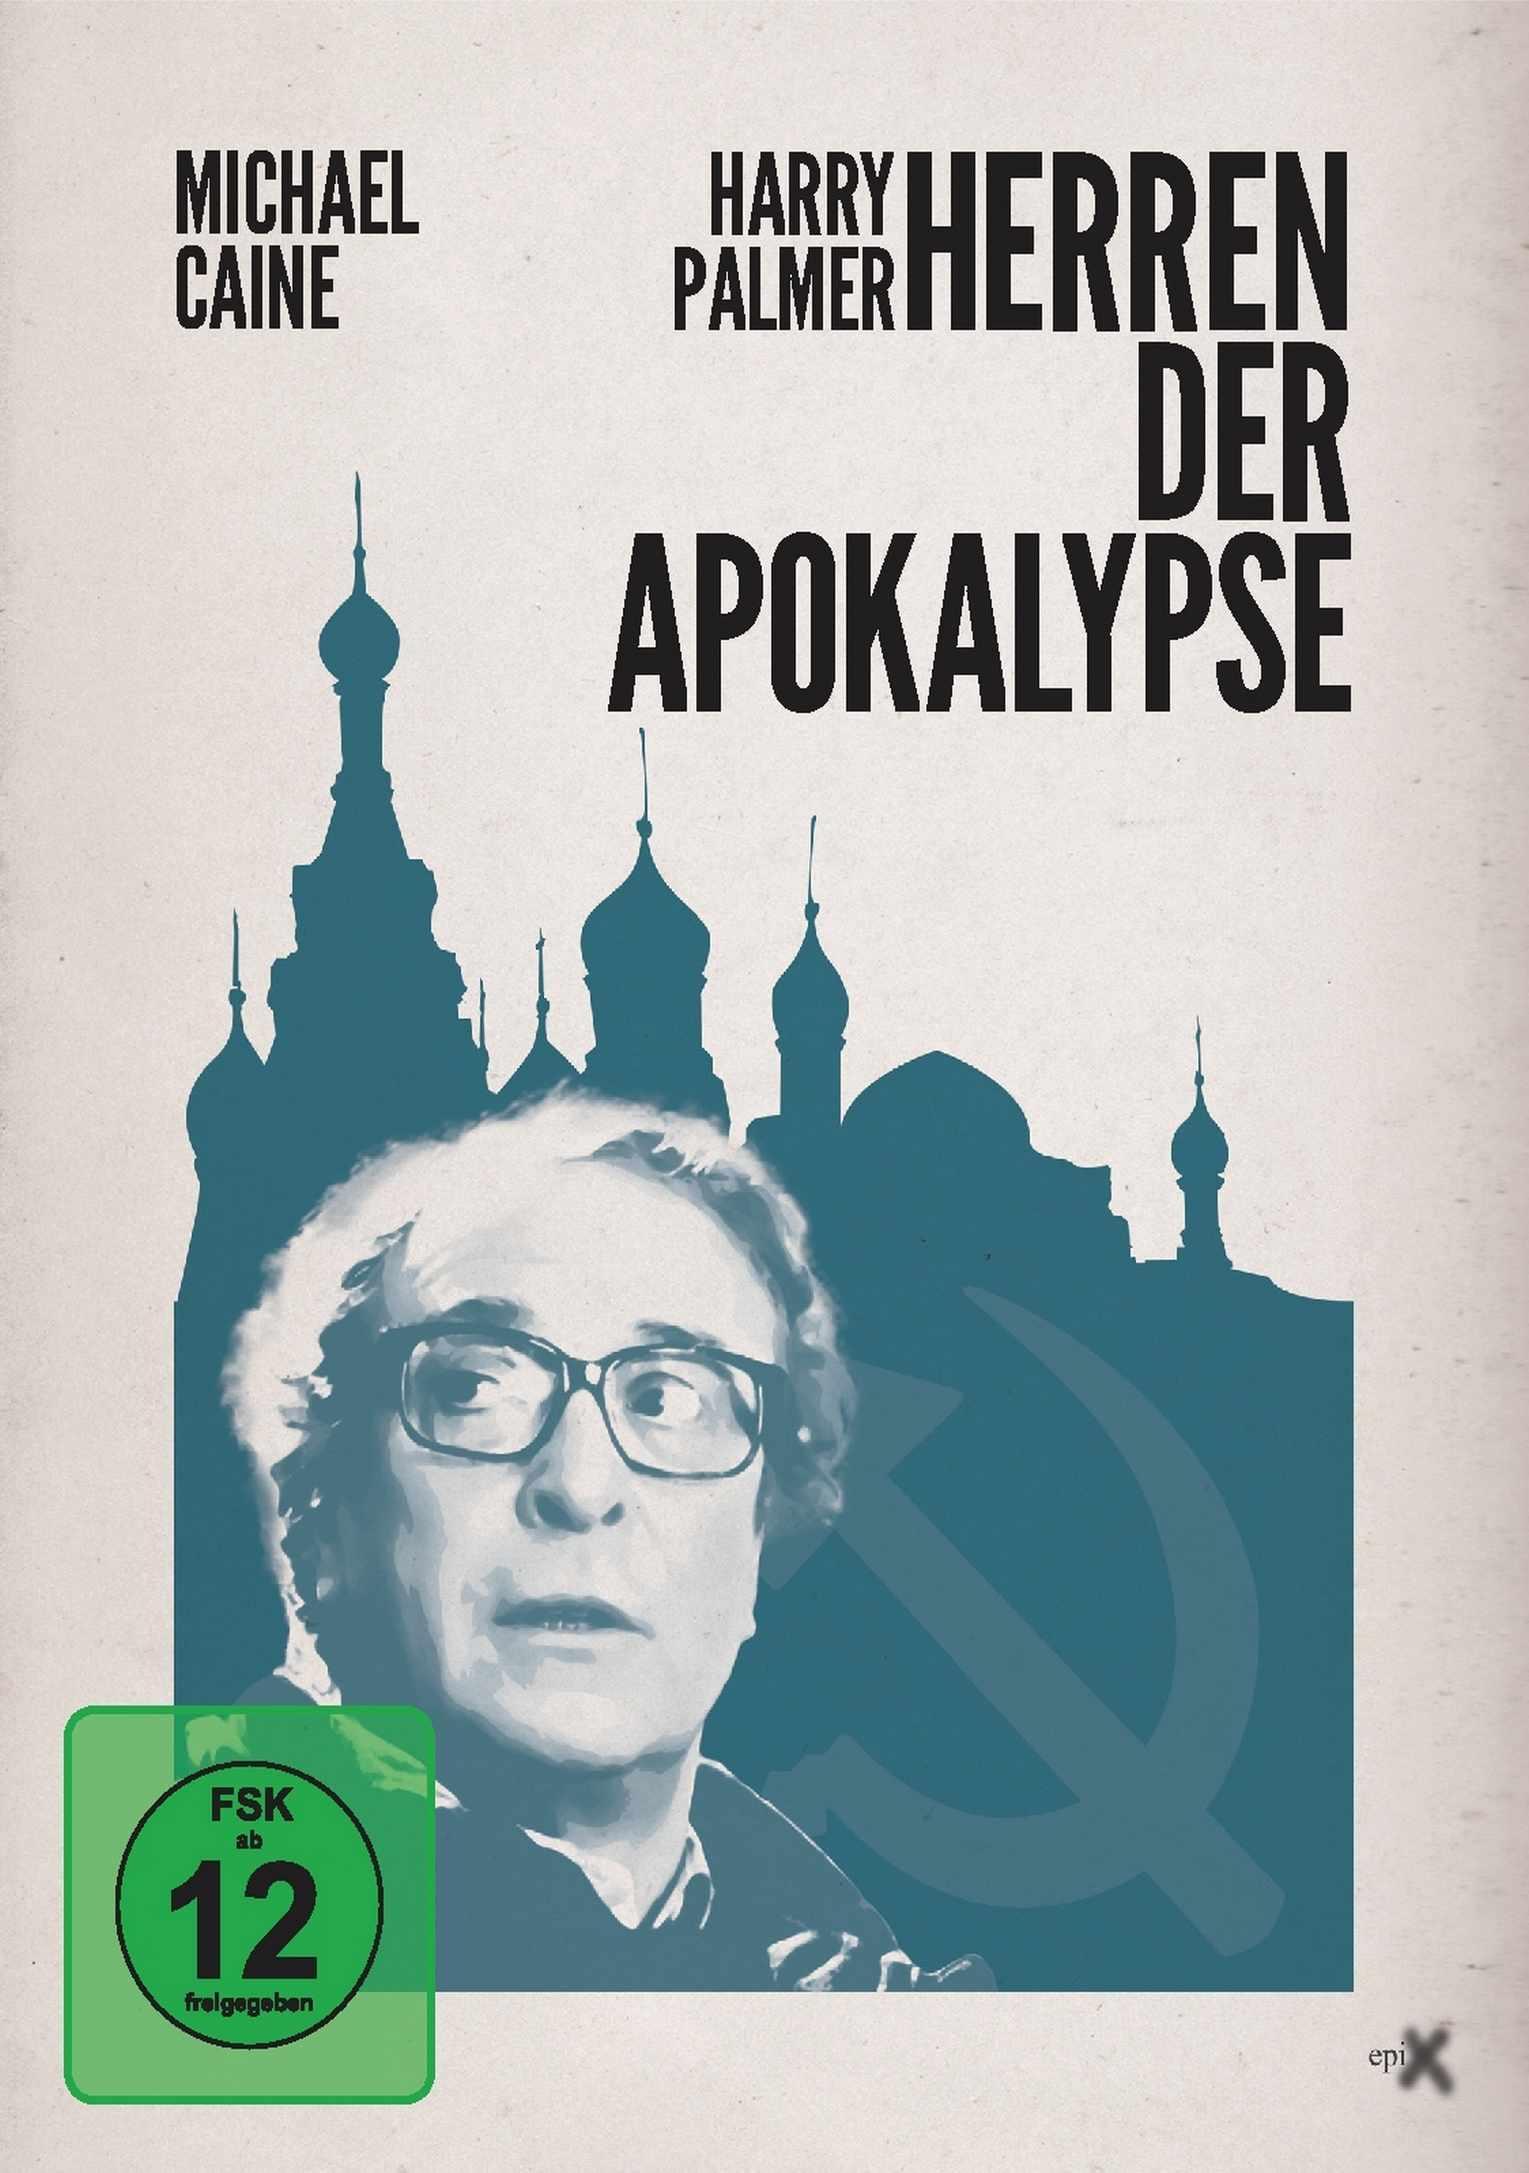 HP - Herren der Apokalypse - Front v.1.0